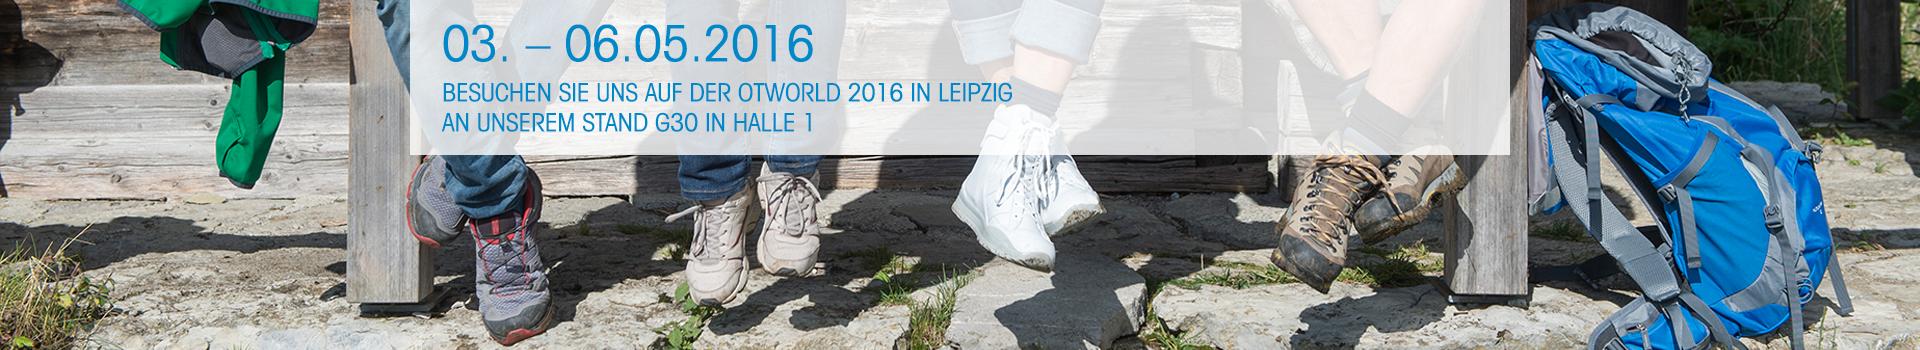 startslider-ortworld-2016-05